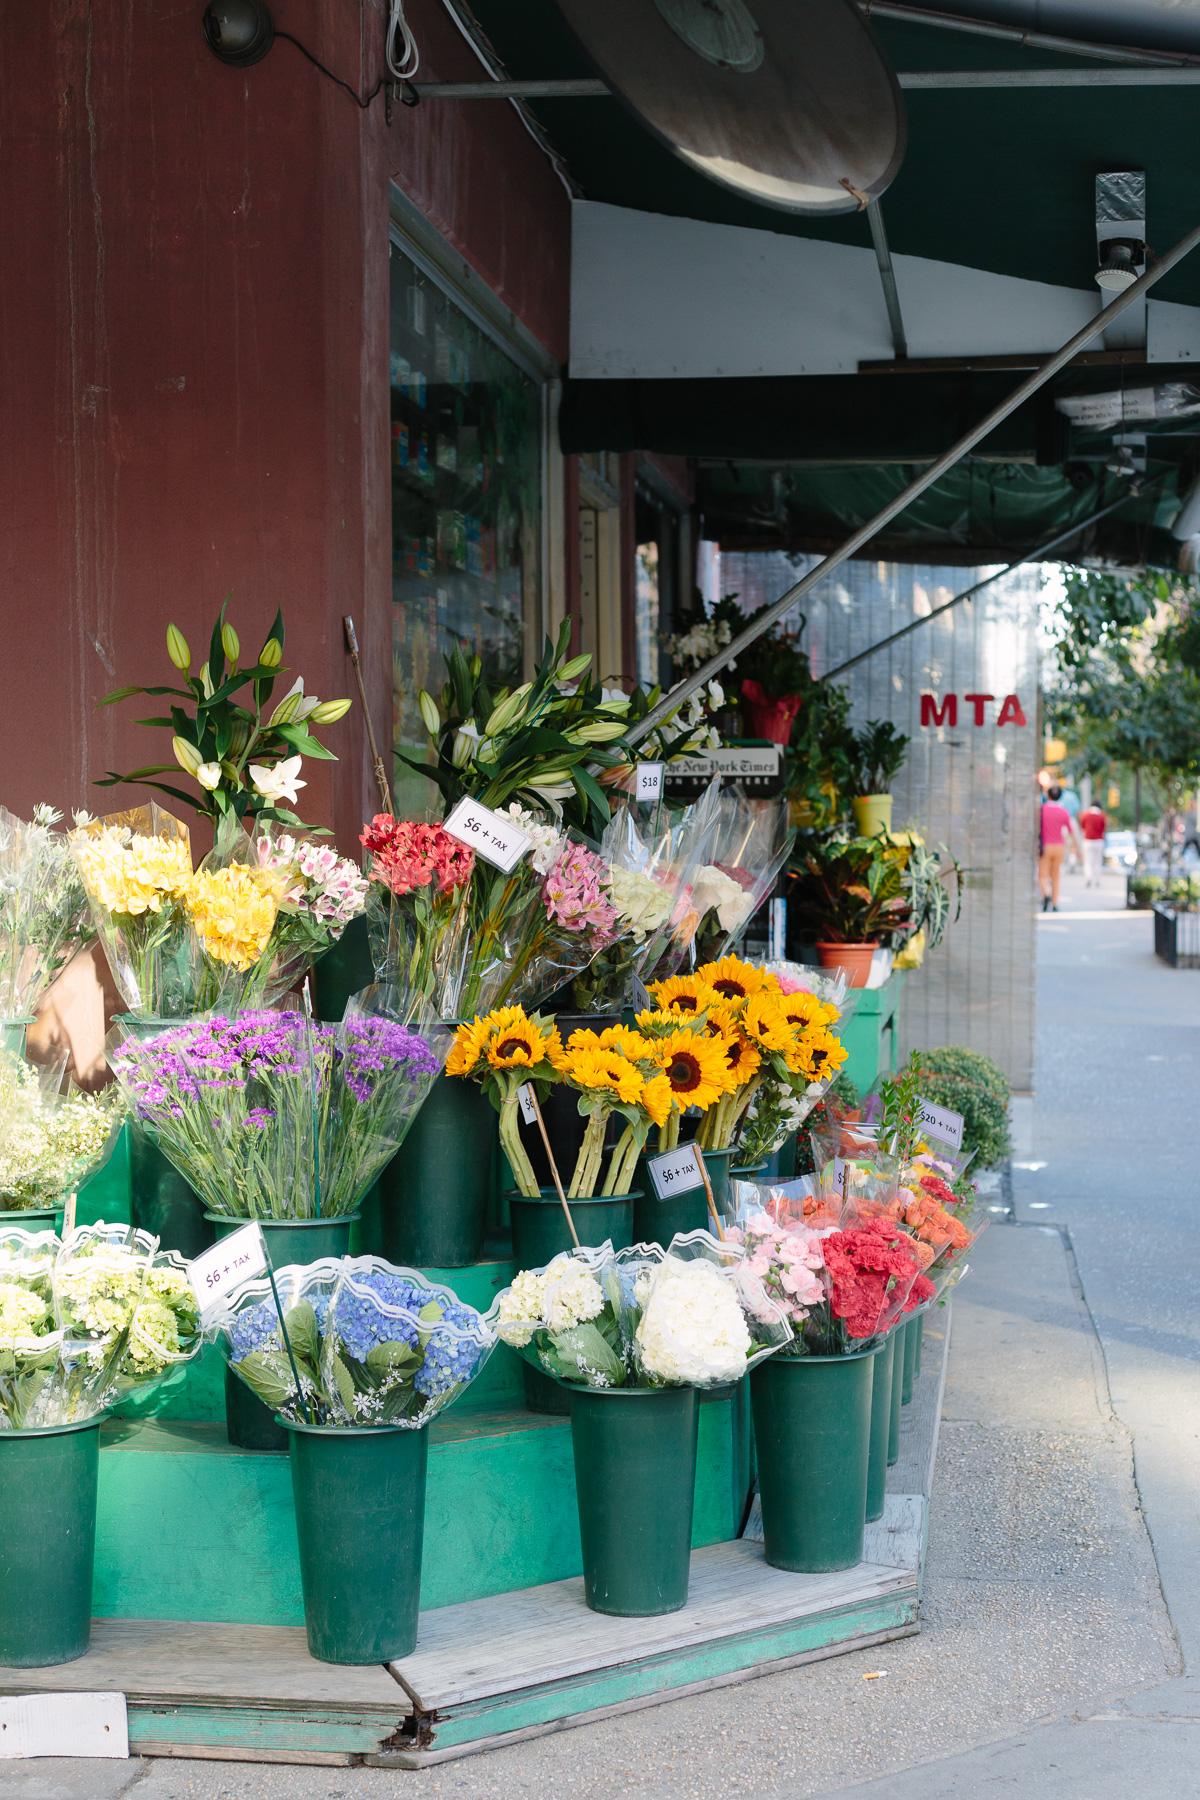 nyc-bodega-flowers-6091